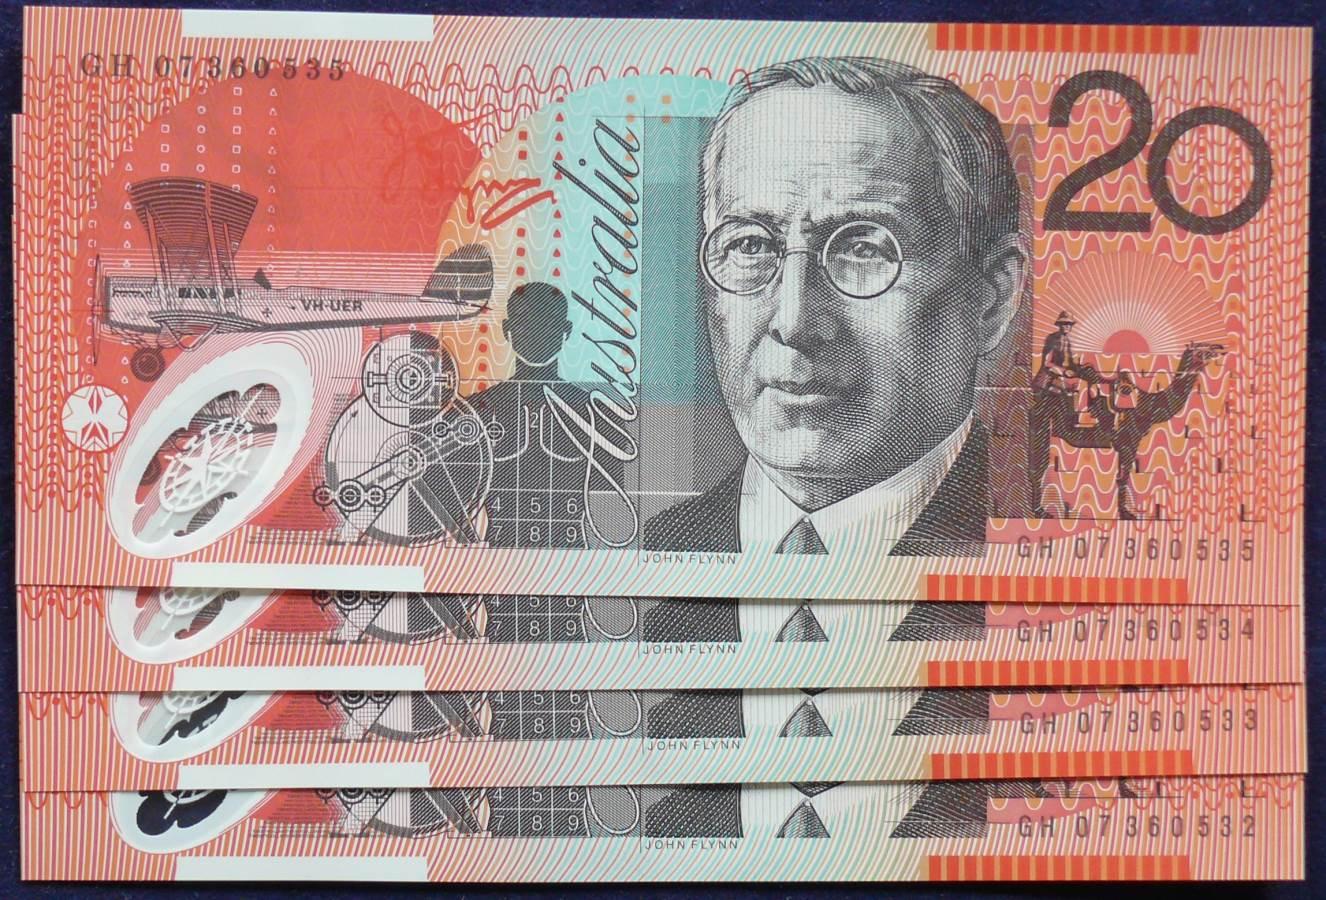 2007 Australia Twenty Dollars x 4 - GH07-B